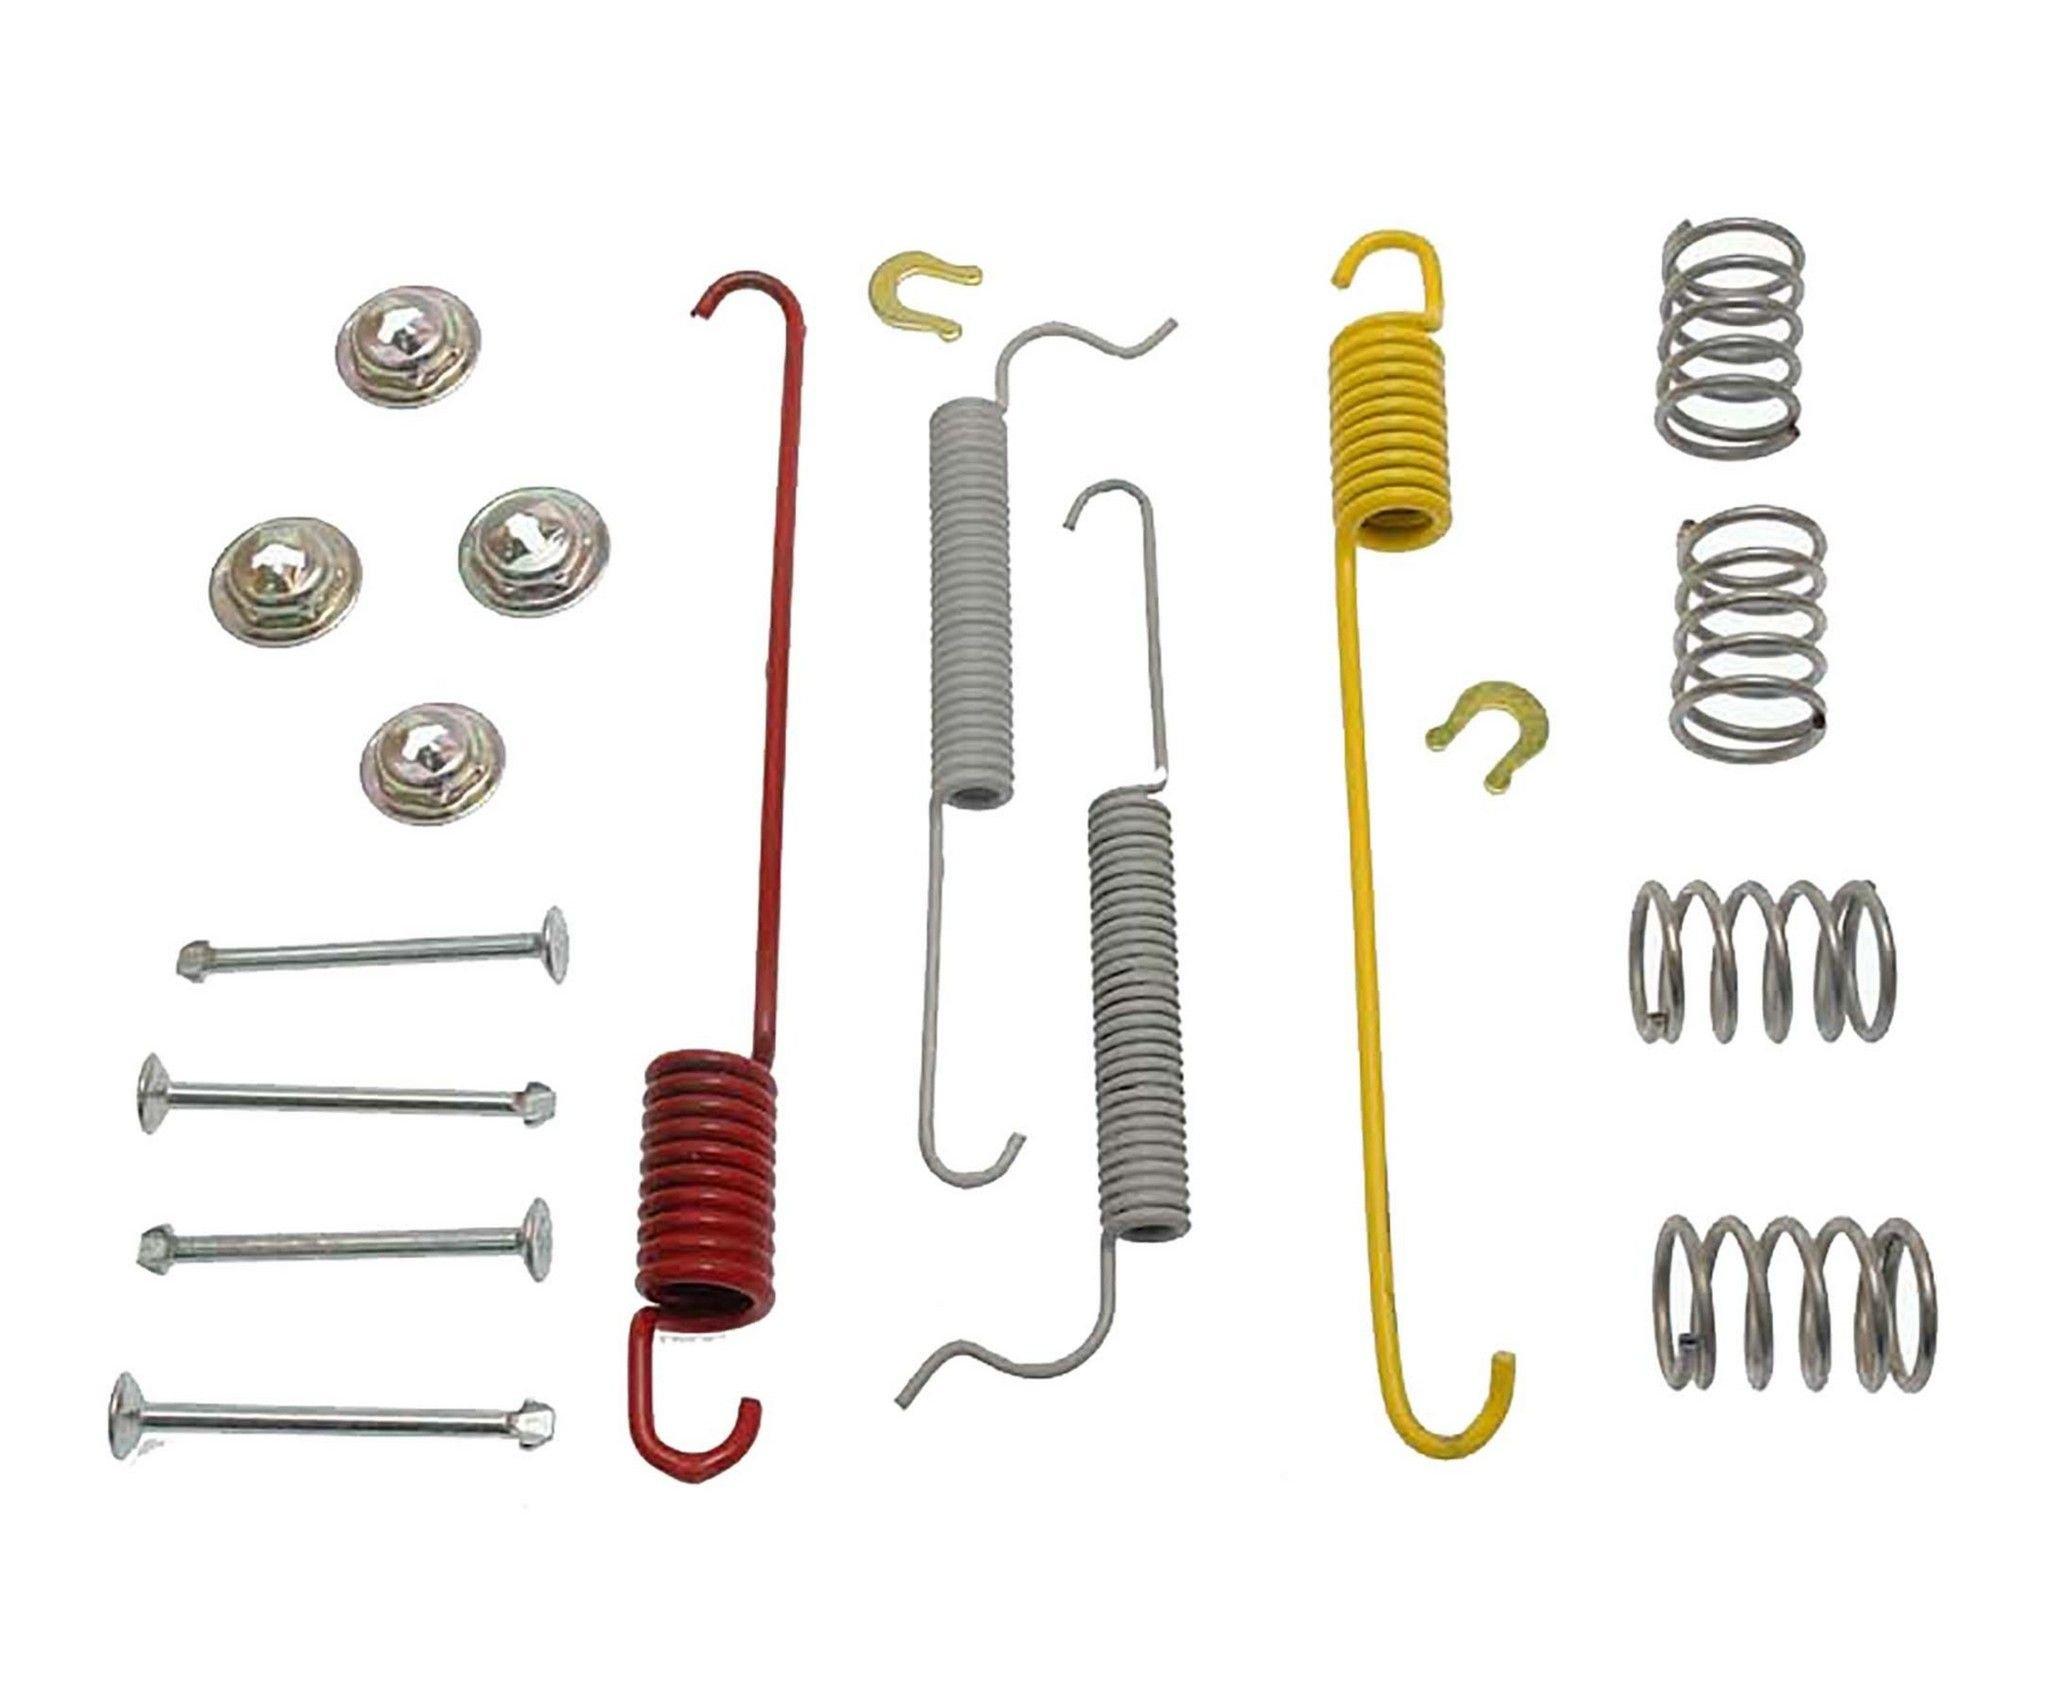 Drum Brake Hardware Kit-Brake Hardware Kit Drum Rear Dorman HW7246